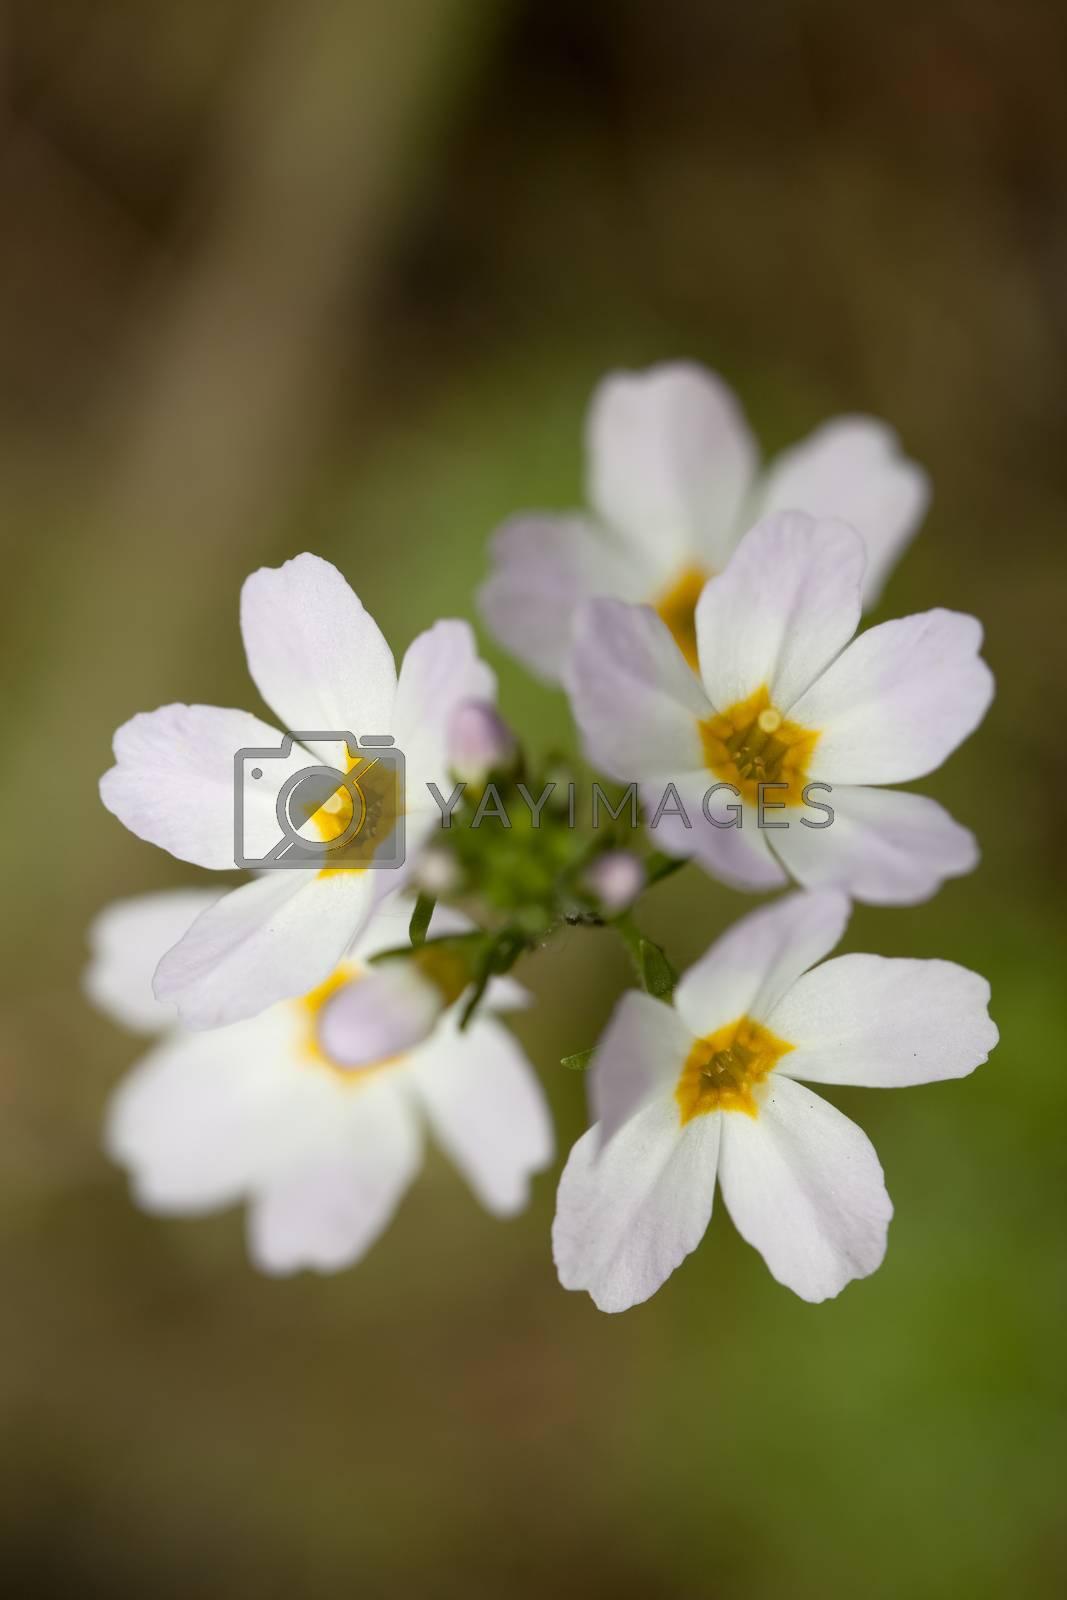 aquatic flower (Hottonia palustris) on blurred background